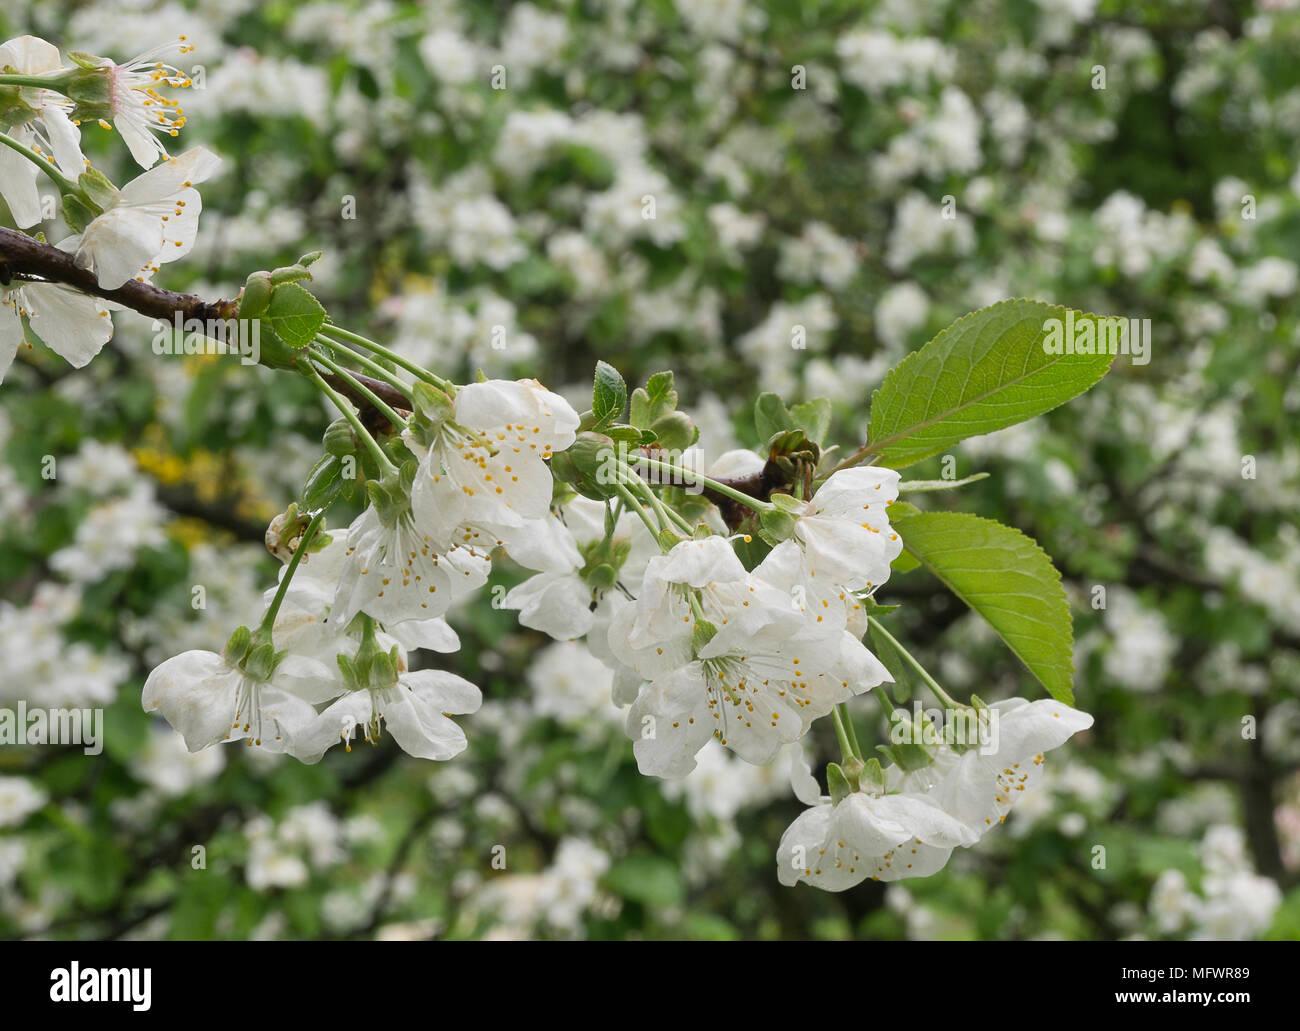 Cherry Blossom Flower Vector Stock Photos & Cherry Blossom Flower ...